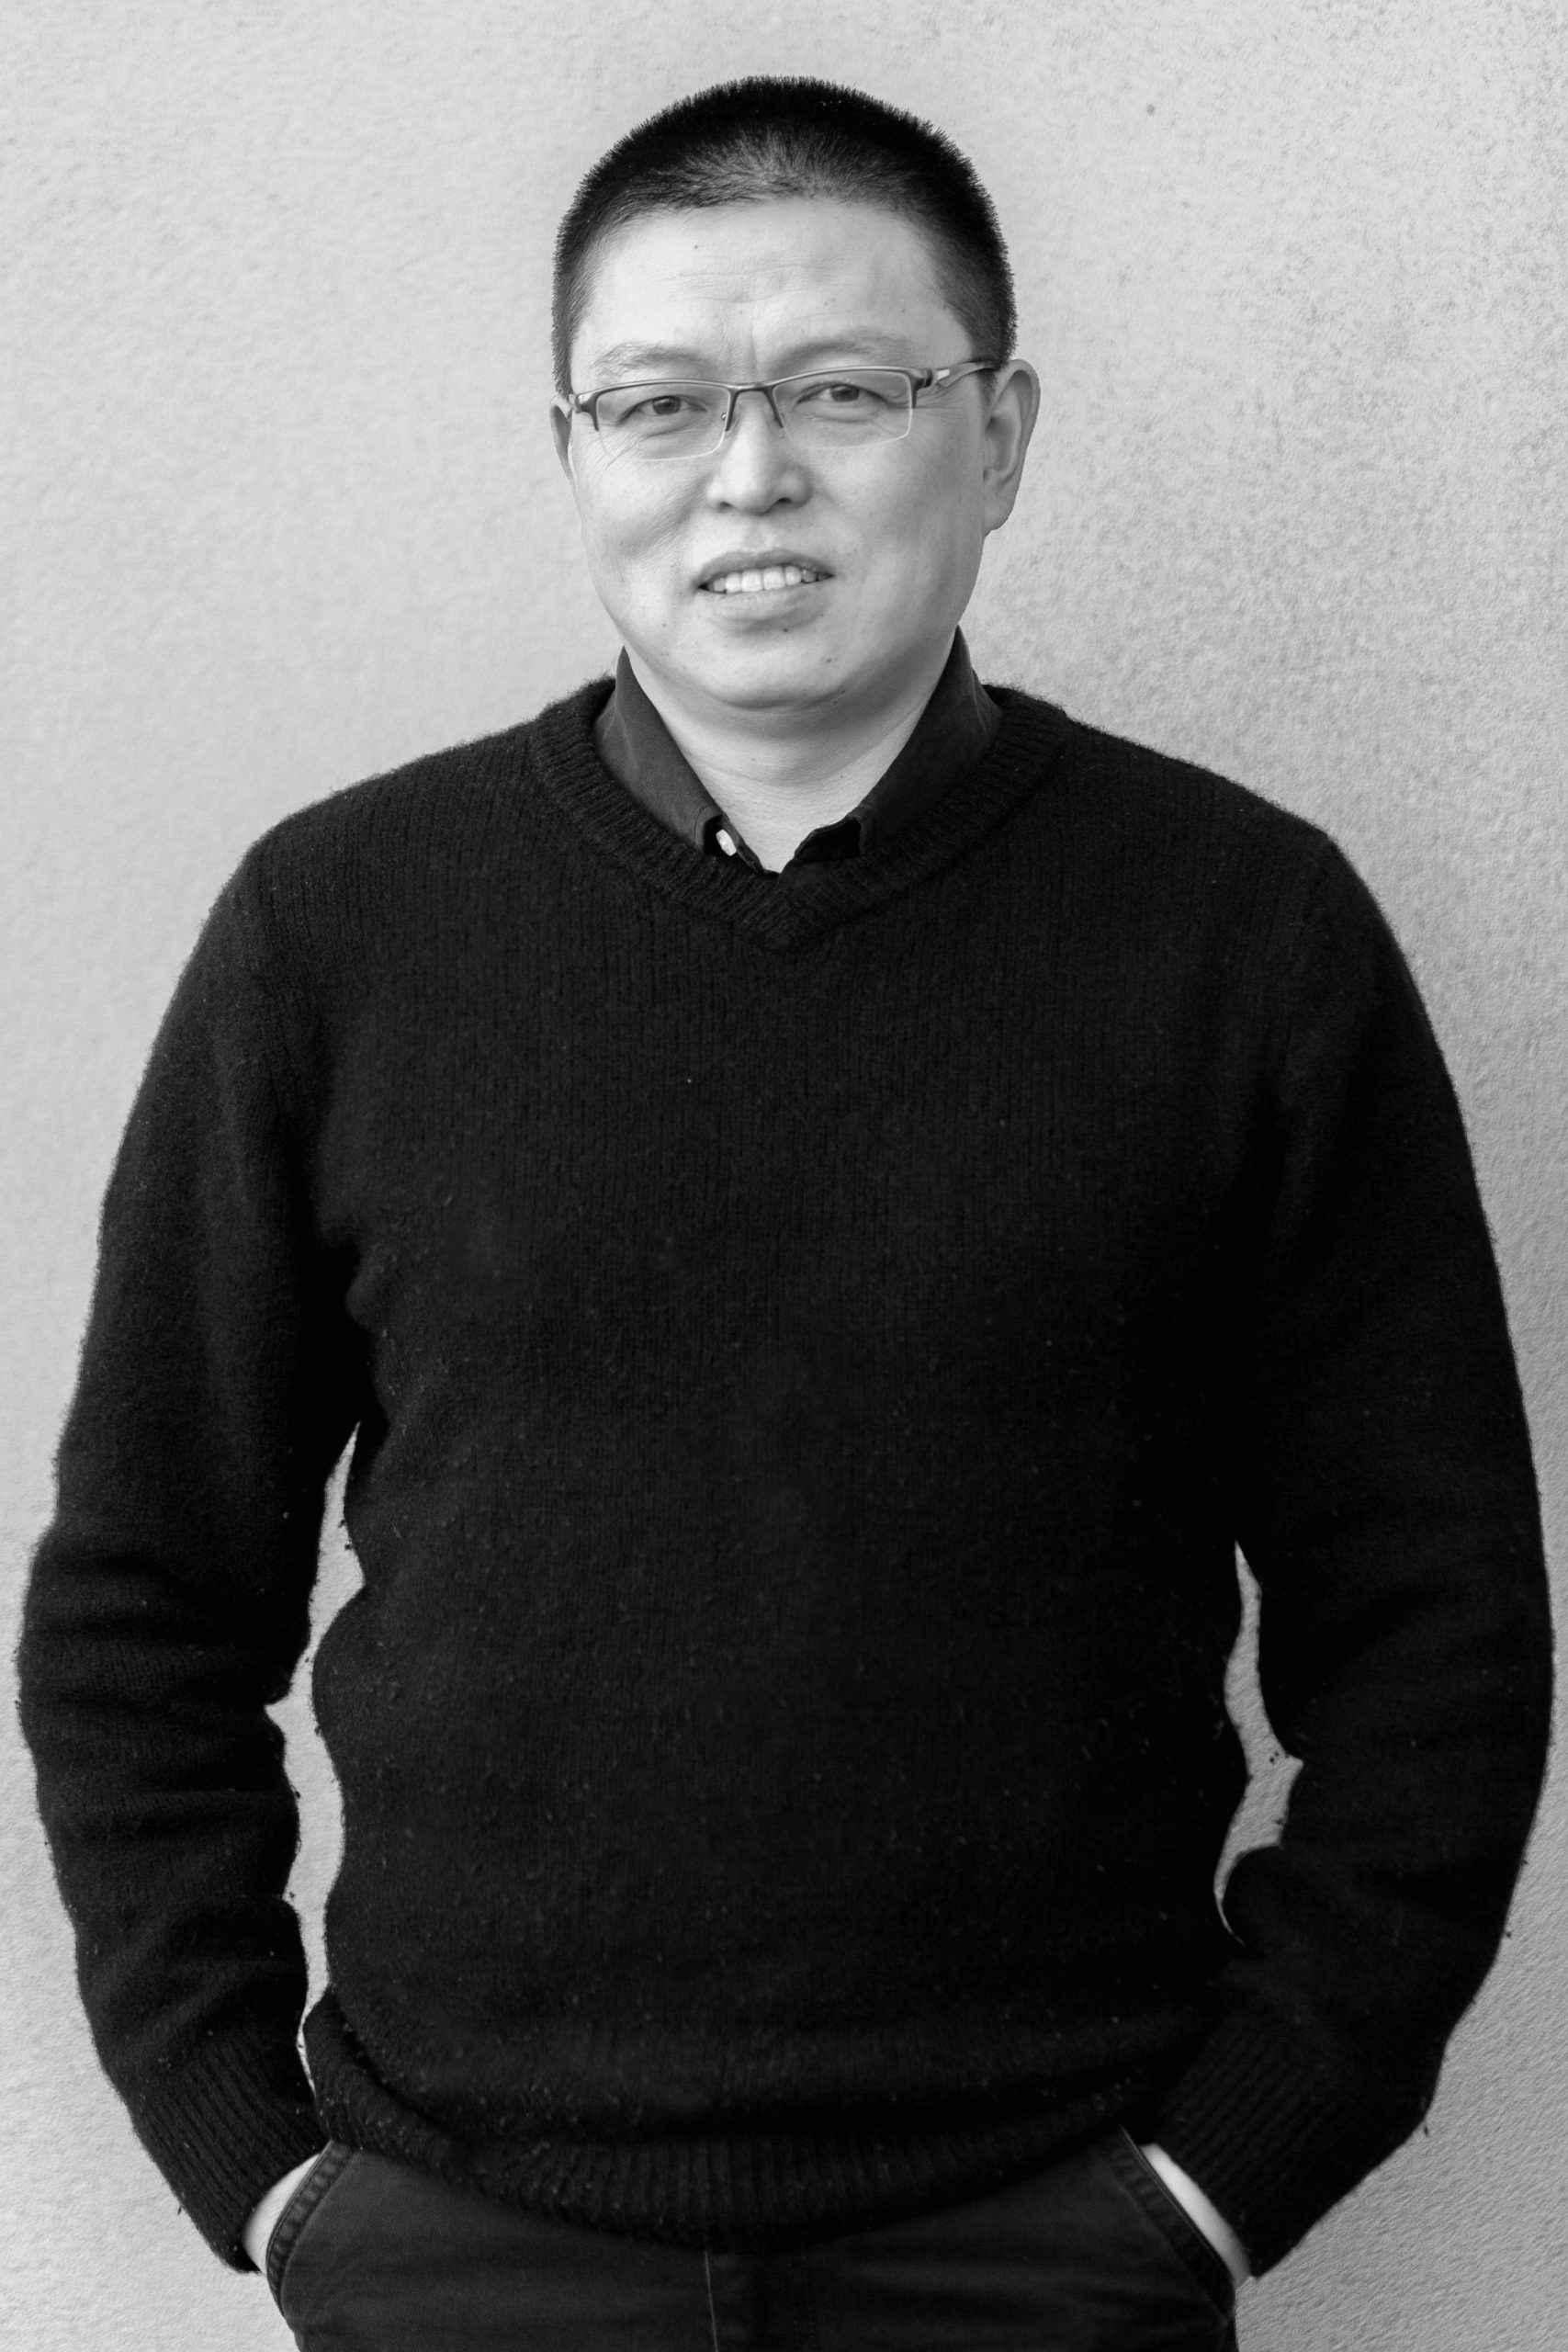 Dr. Patrick Yao